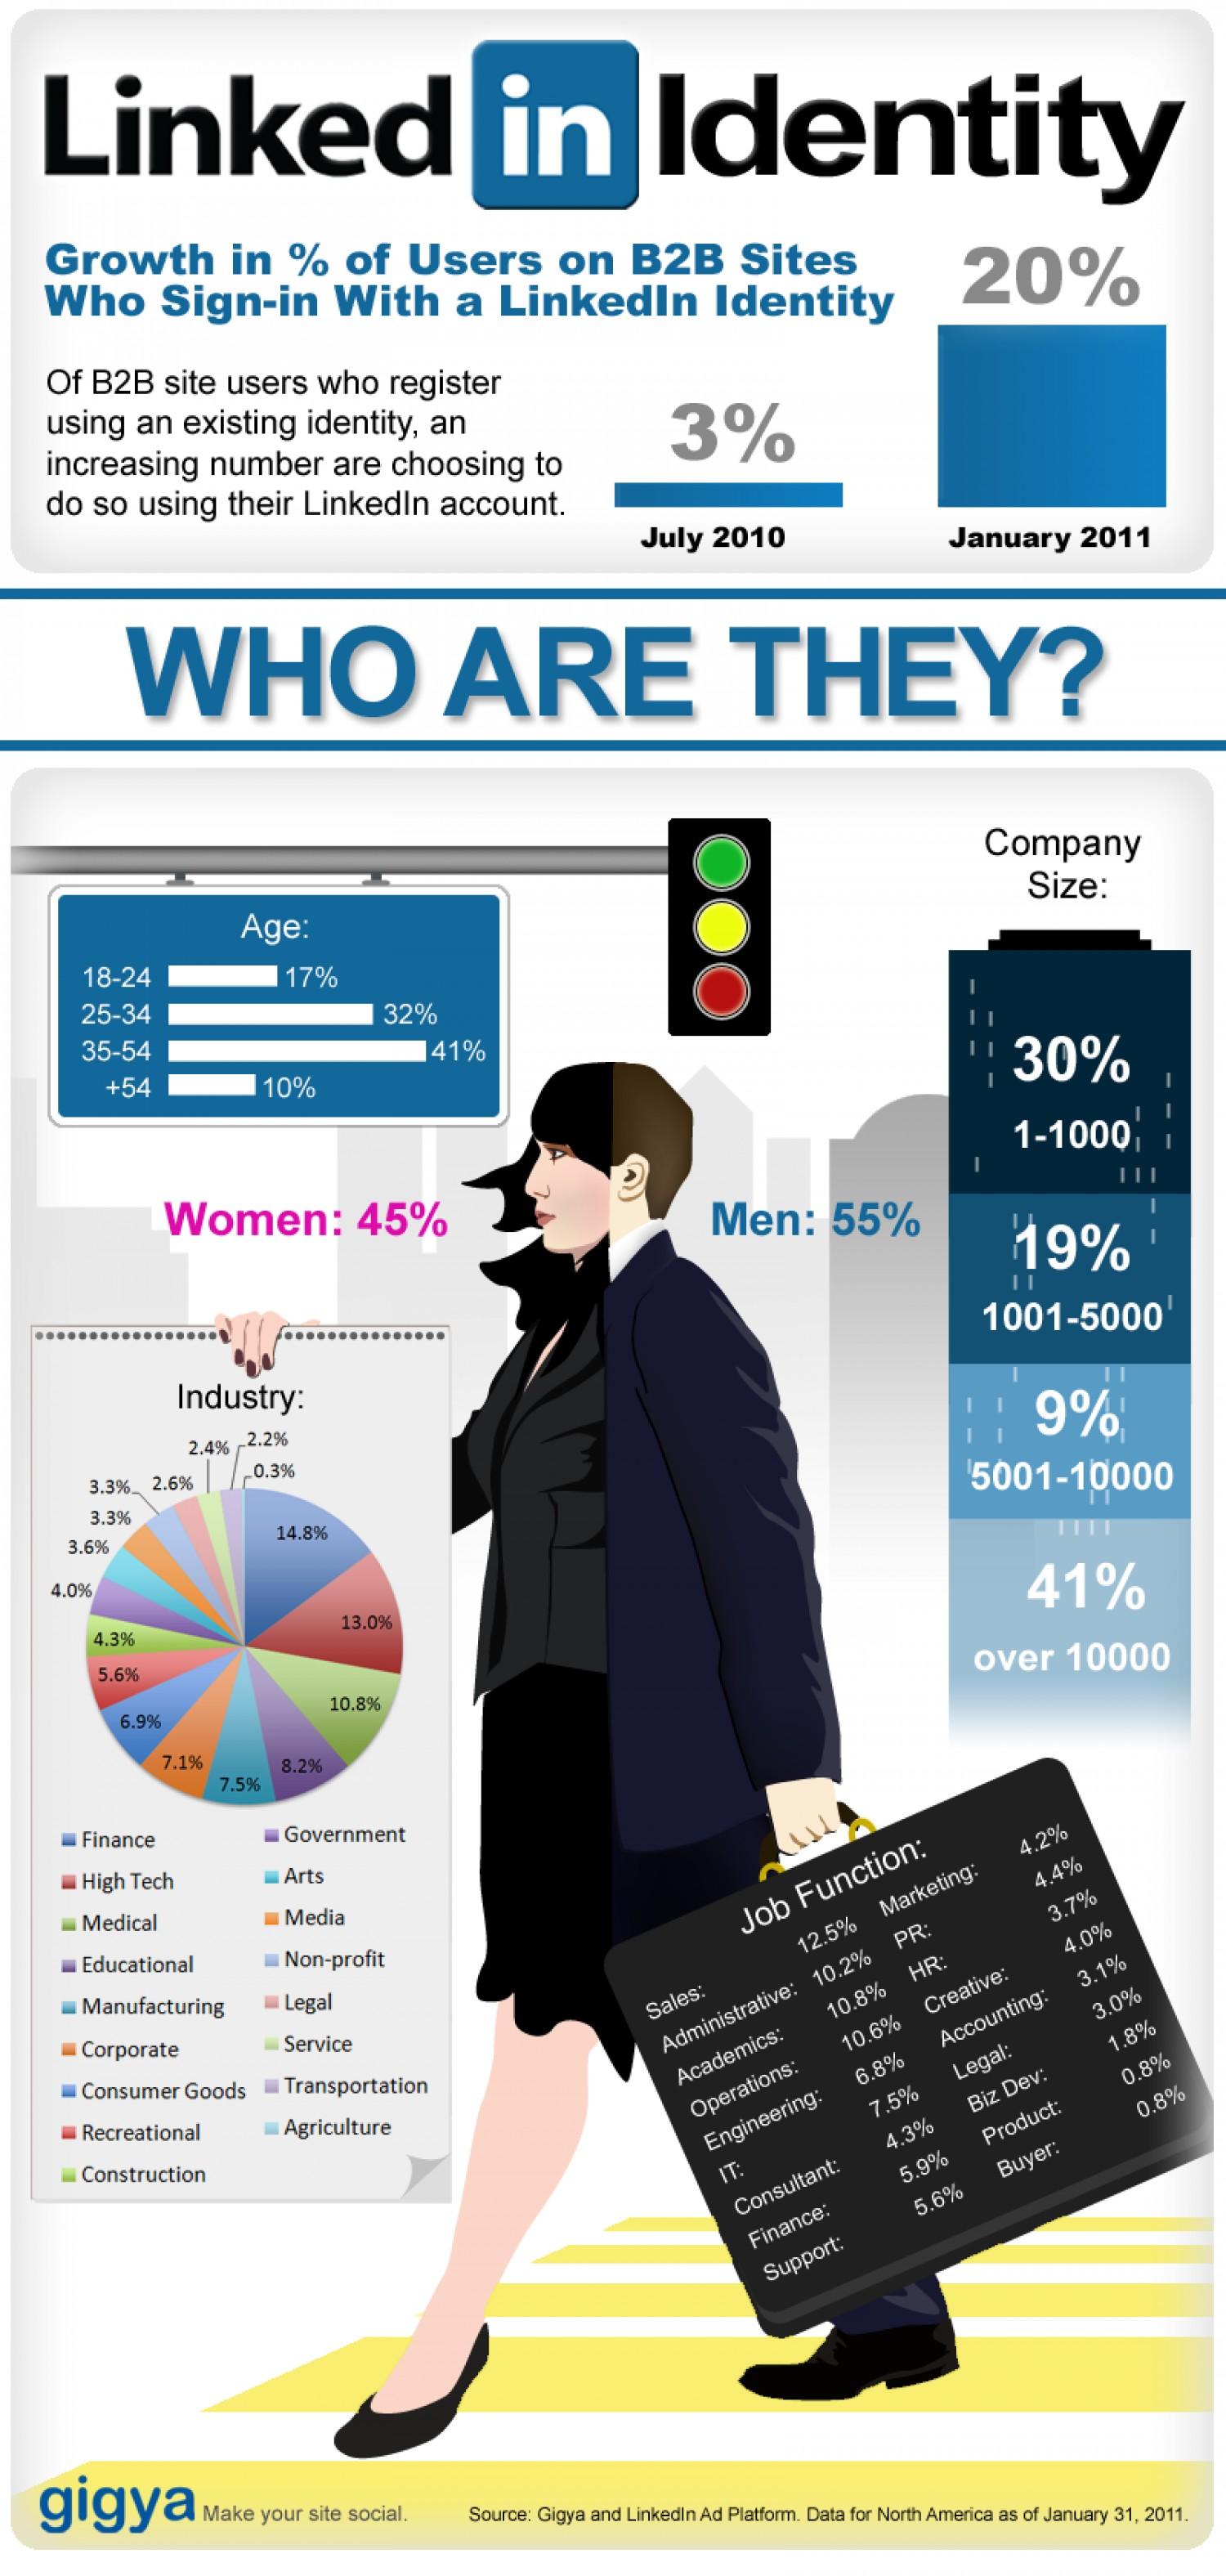 8. The LinkedIn Identity